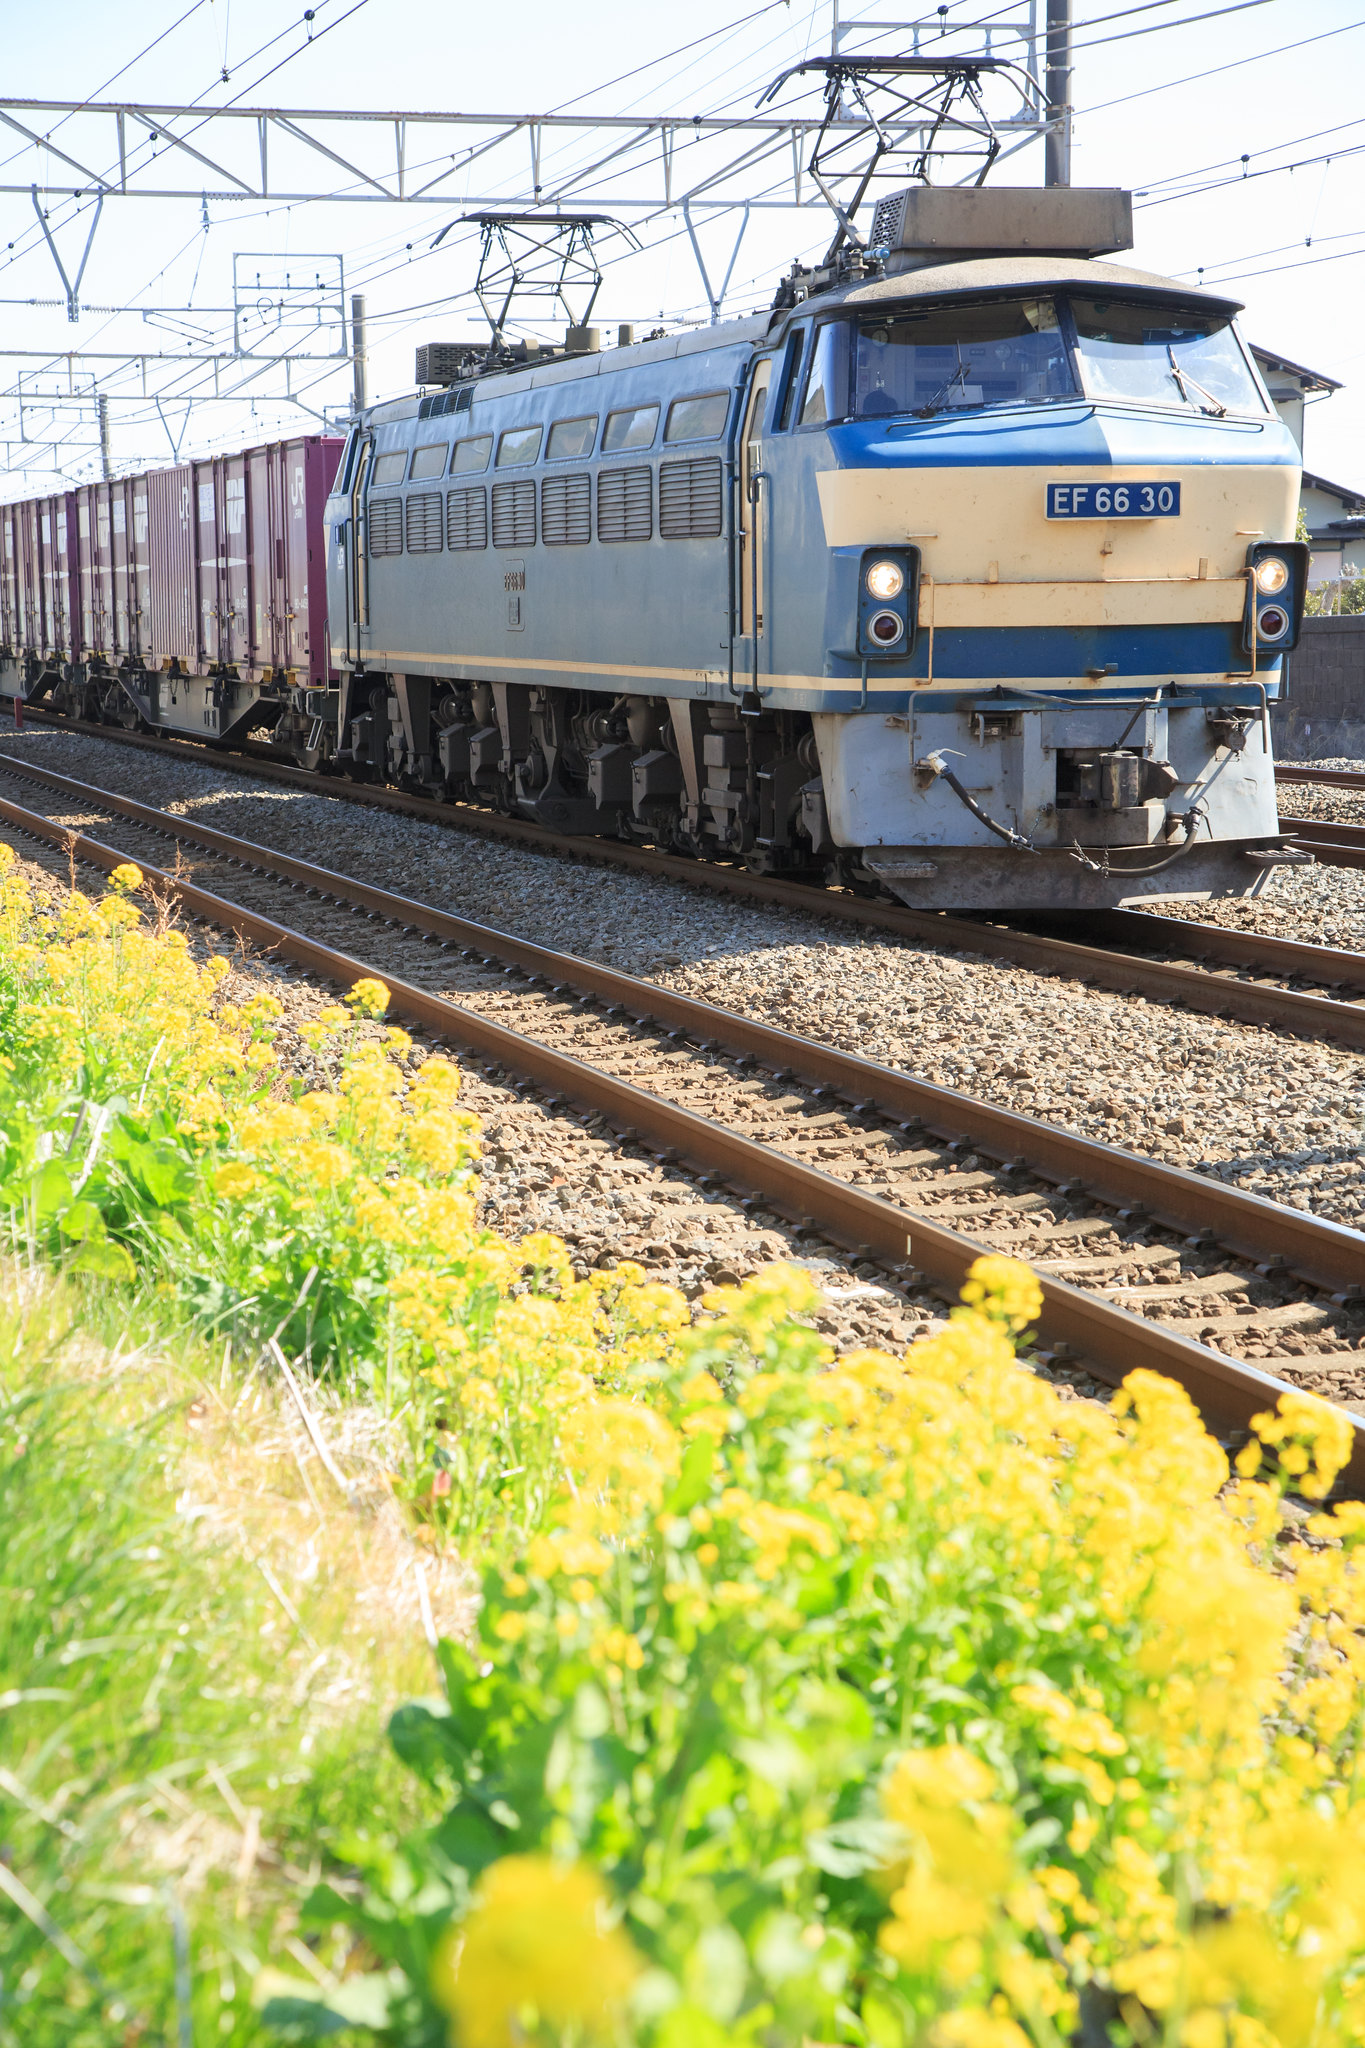 EF66 30 / Tokaido Line